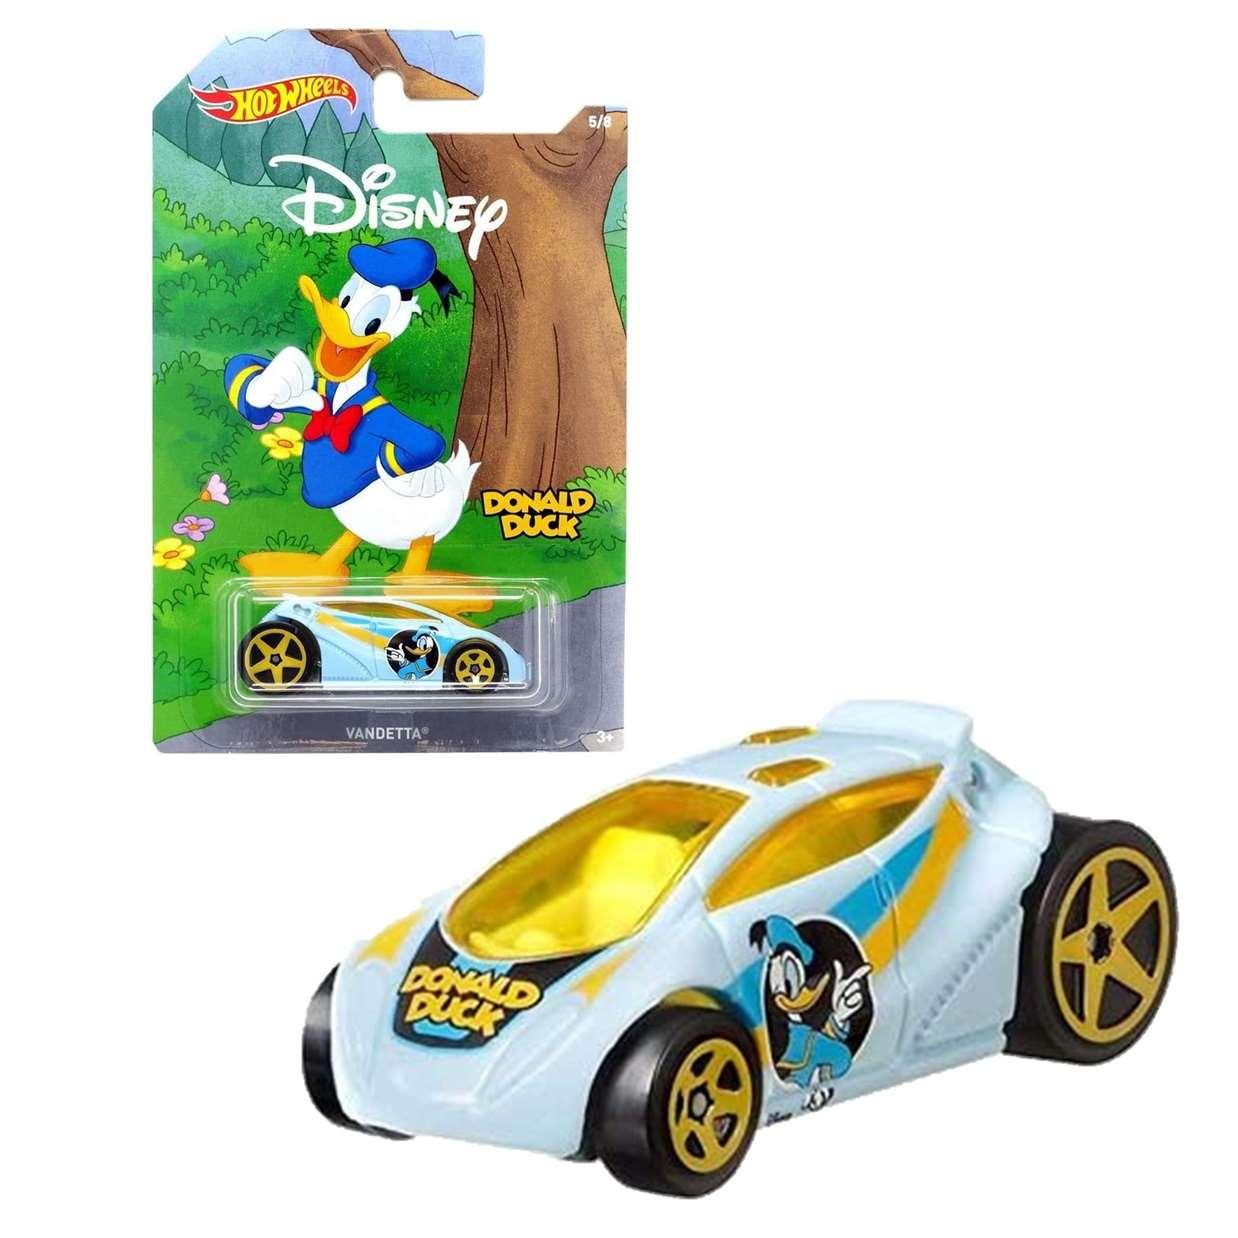 Donald Duck Vandetta 5/8 Hot Wheels Disney Mickey And Friend